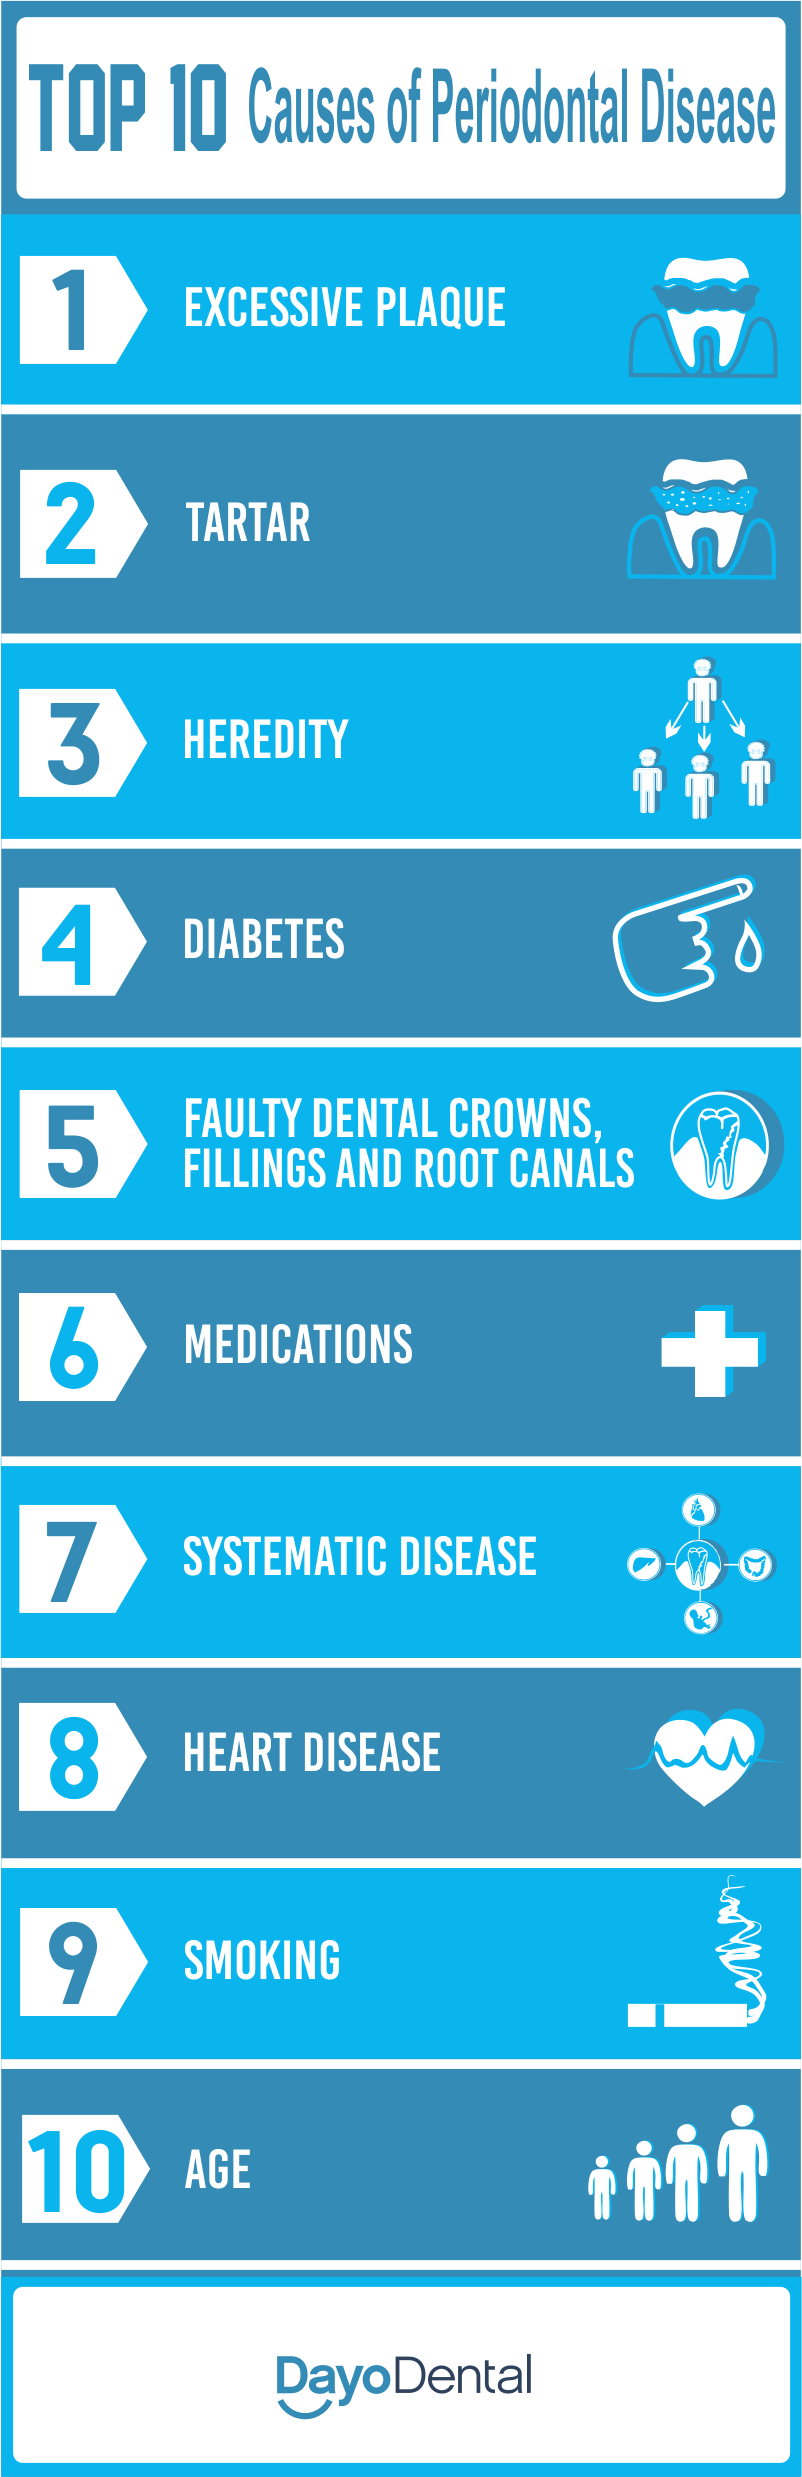 Causes of periodontal disease - Top causes of periodontitis